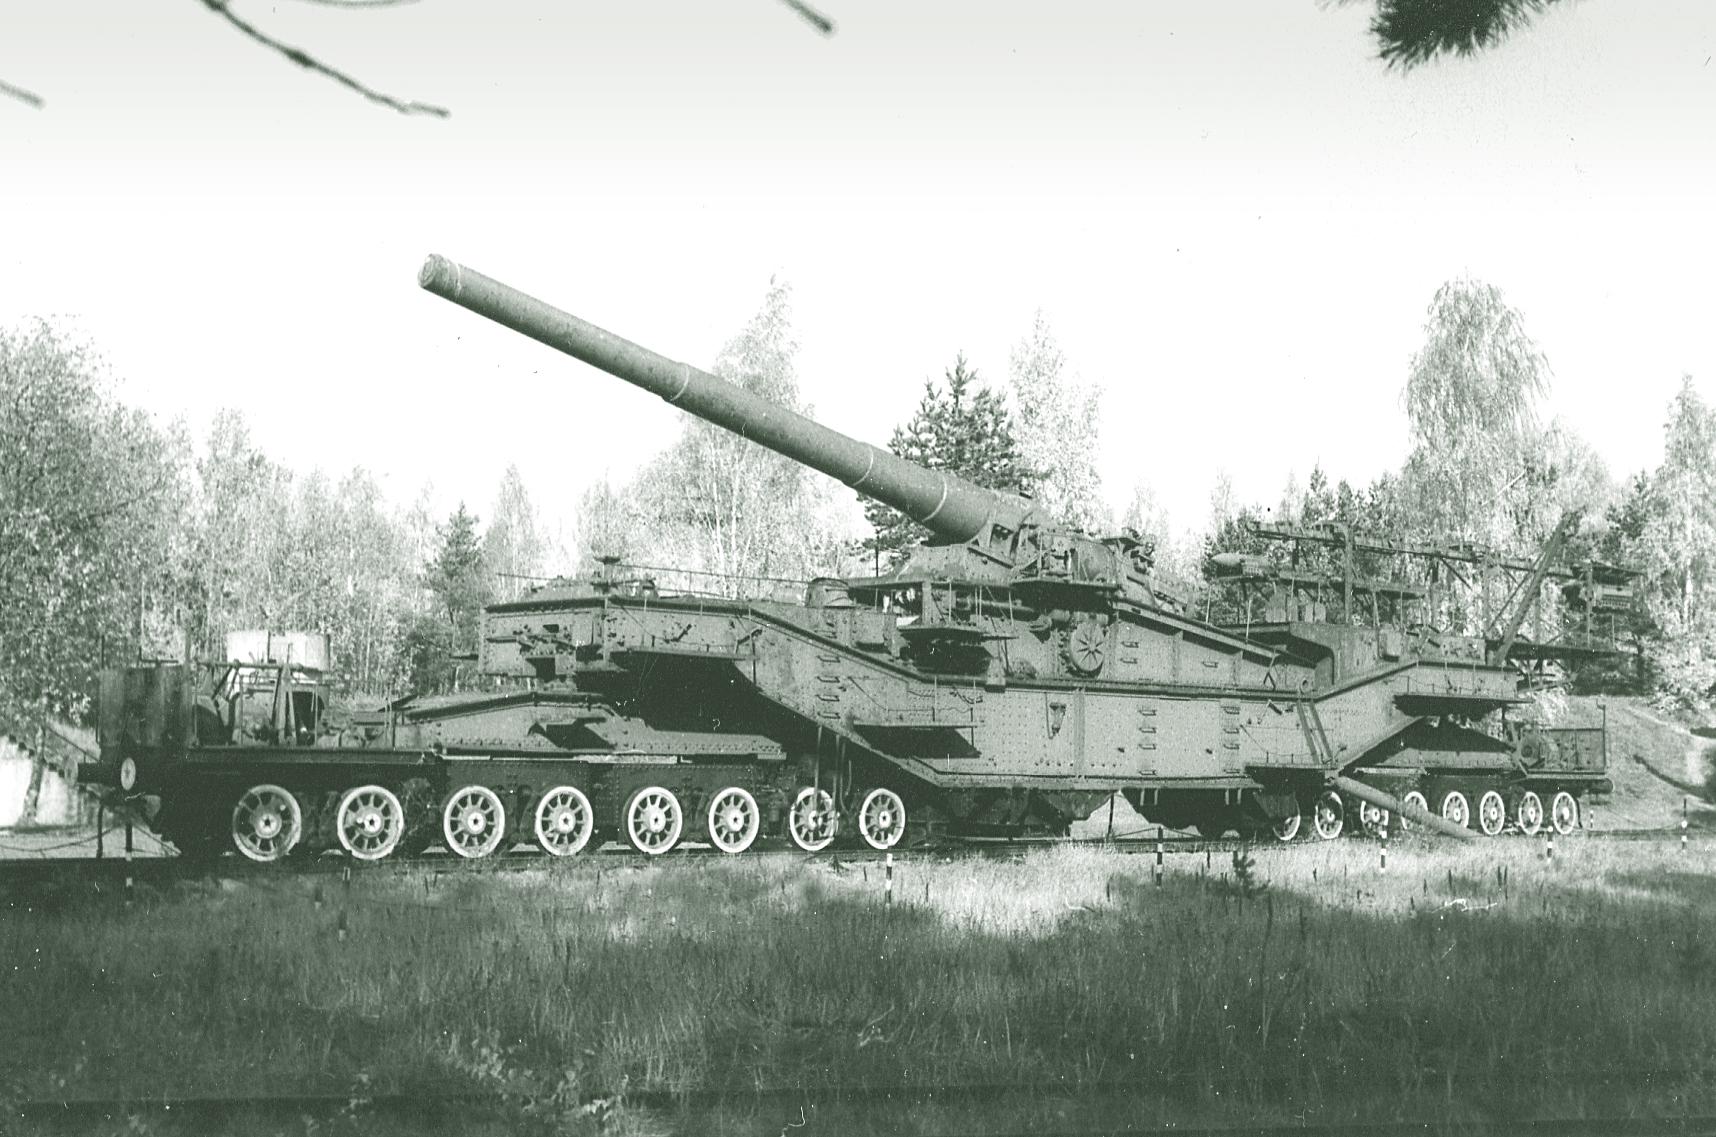 Schwerer Gustav and Dora – weapon of history